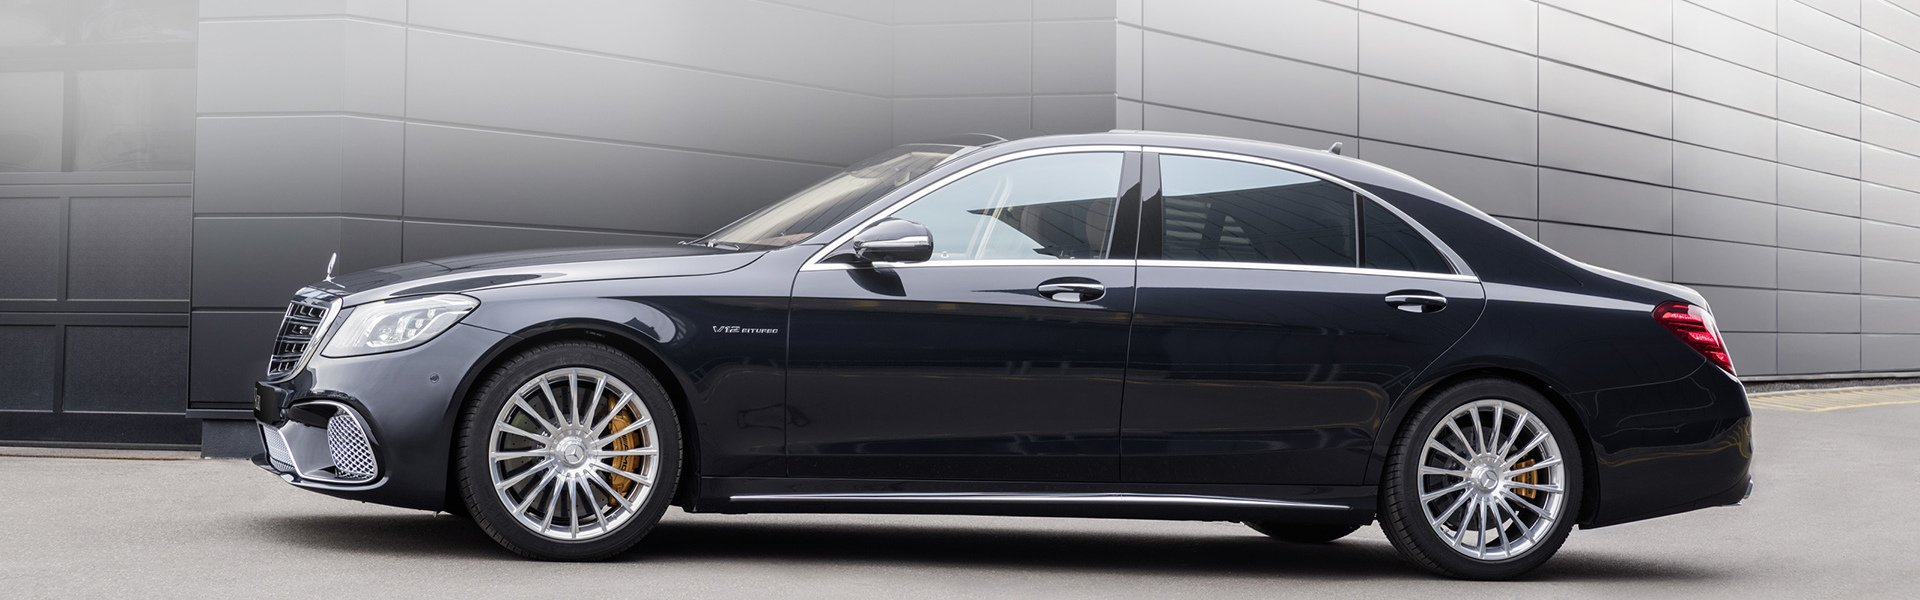 Mercedes-AMG S-Класс седан